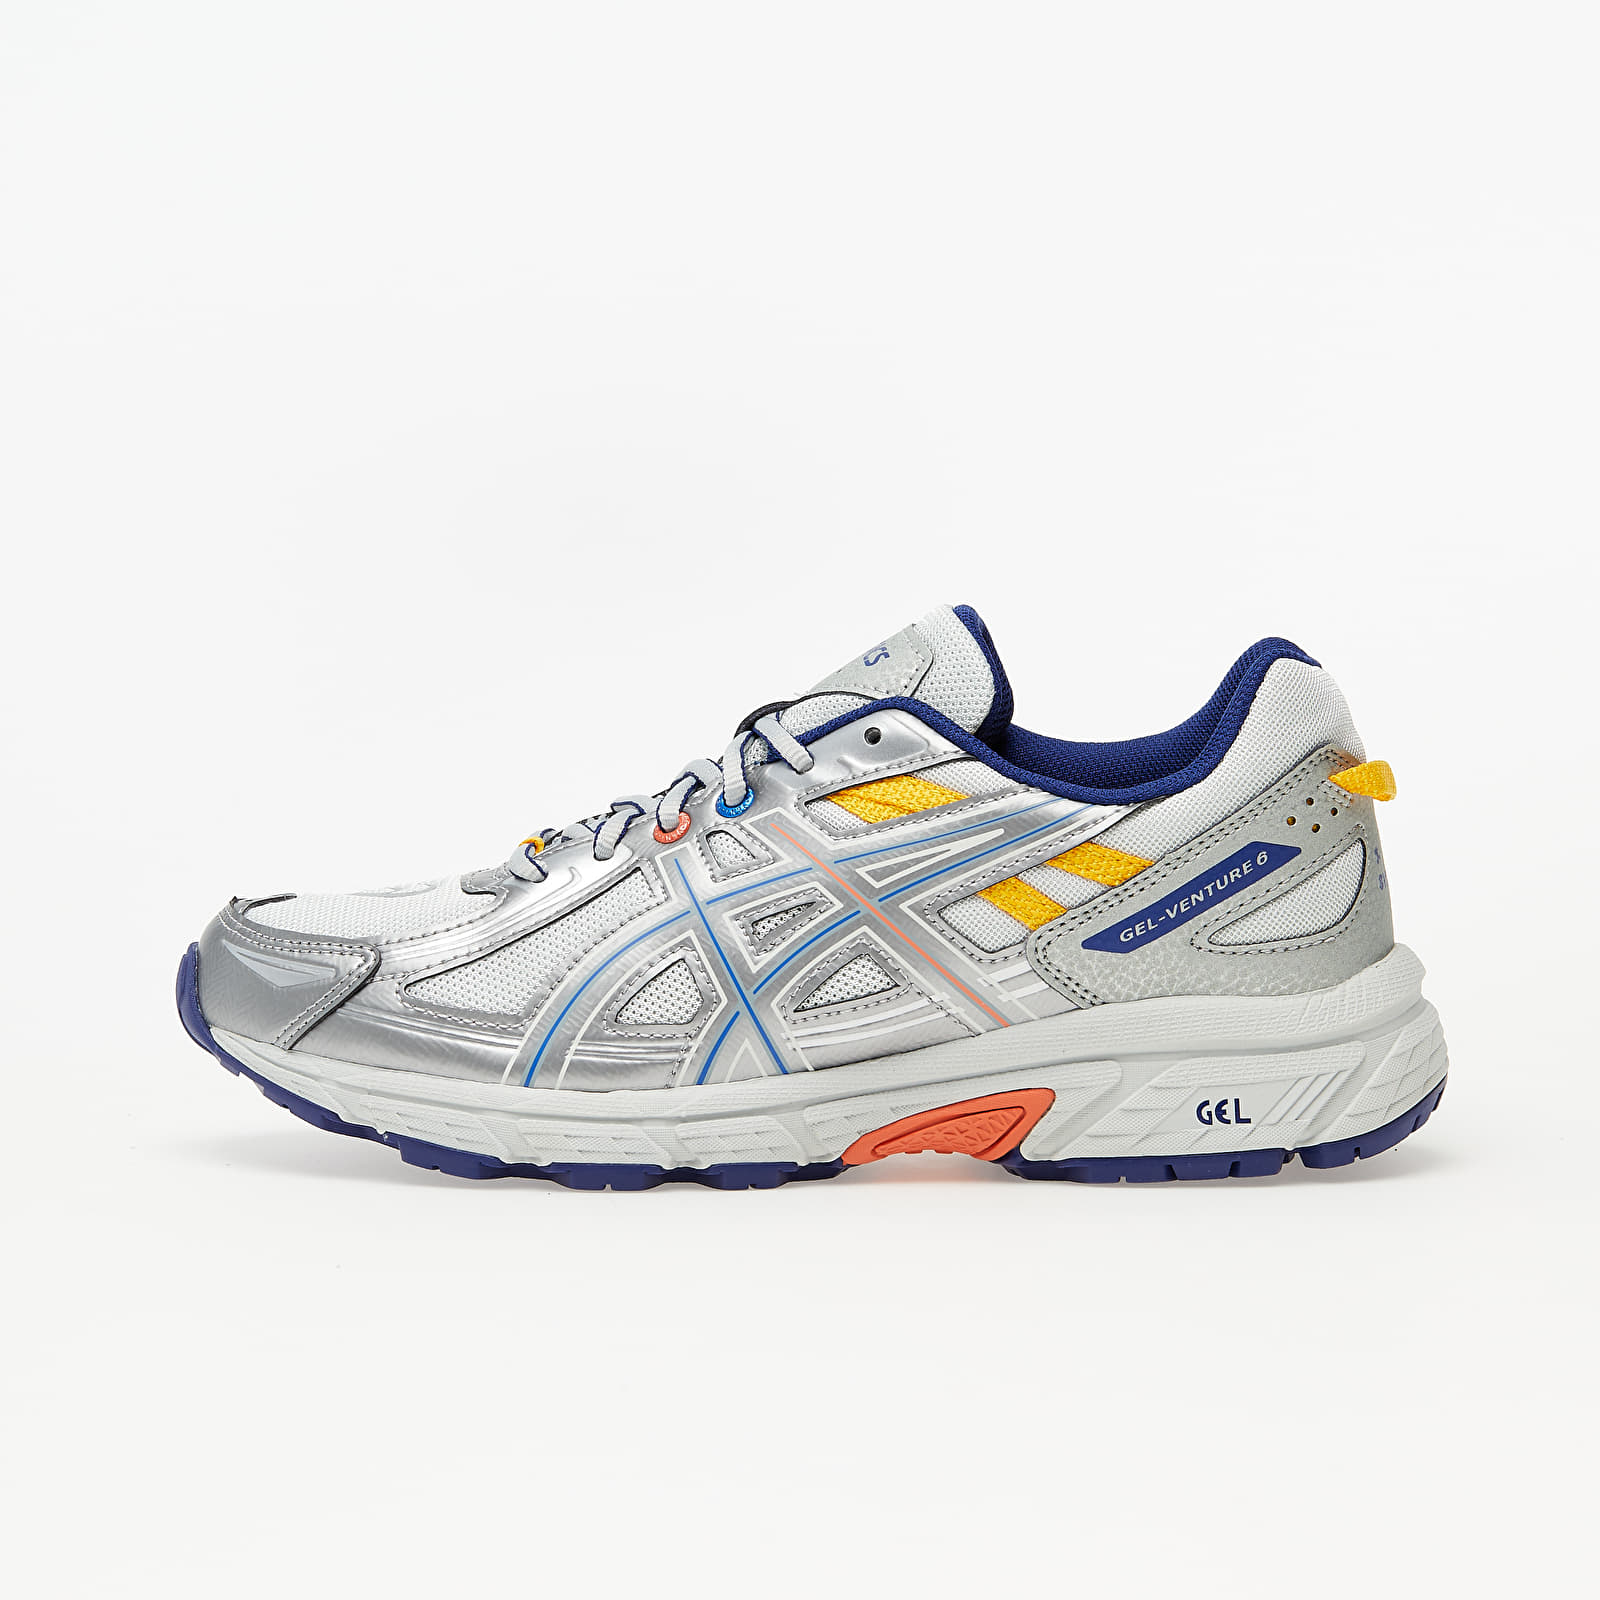 Pánske tenisky a topánky Asics x IAB Studio Gel-Venture 6 Silver/ Blue